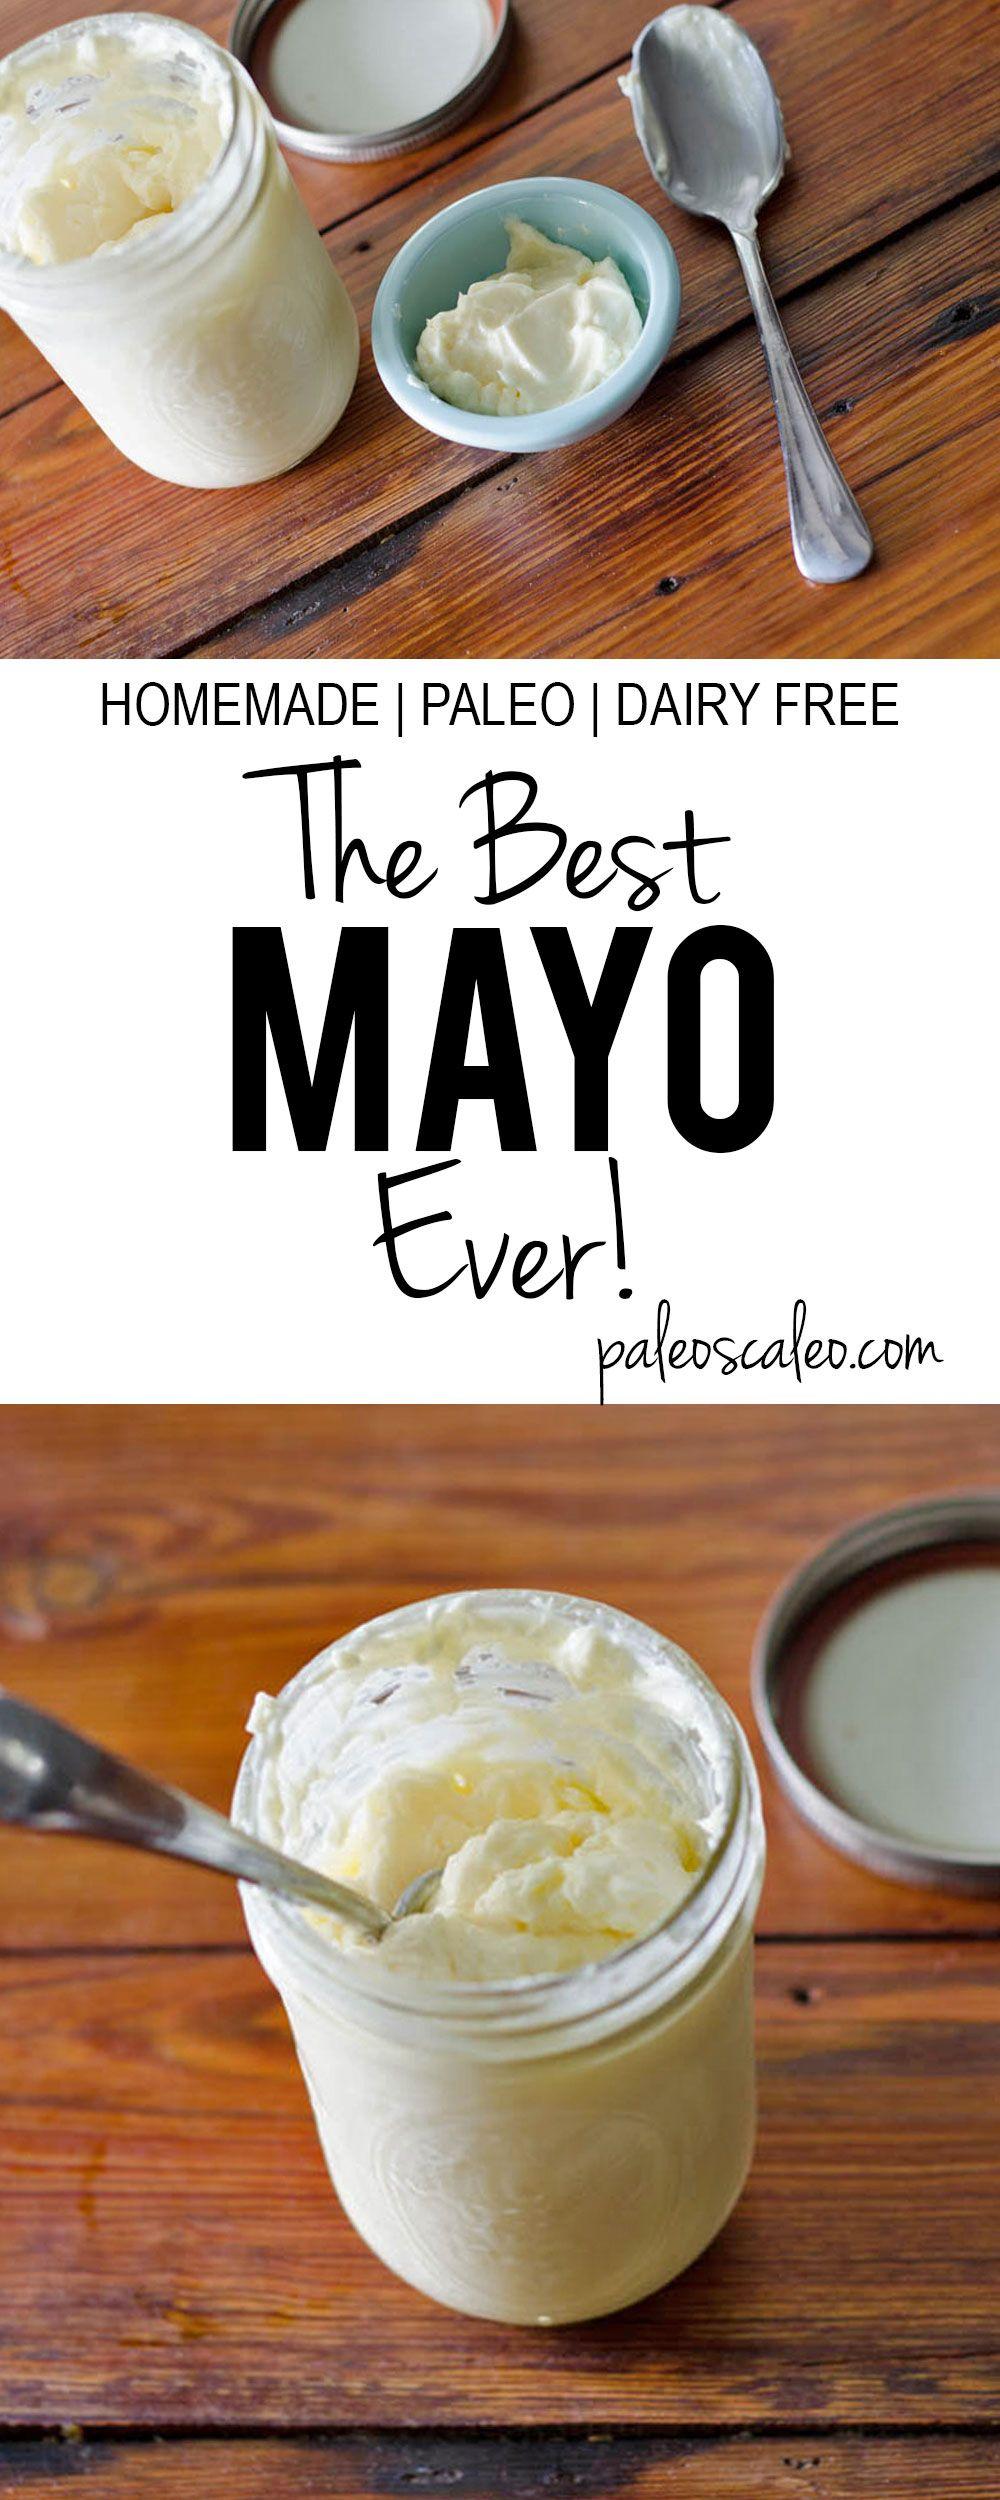 5 Minute Mayo Recipe Paleo sauces, Food recipes, Whole